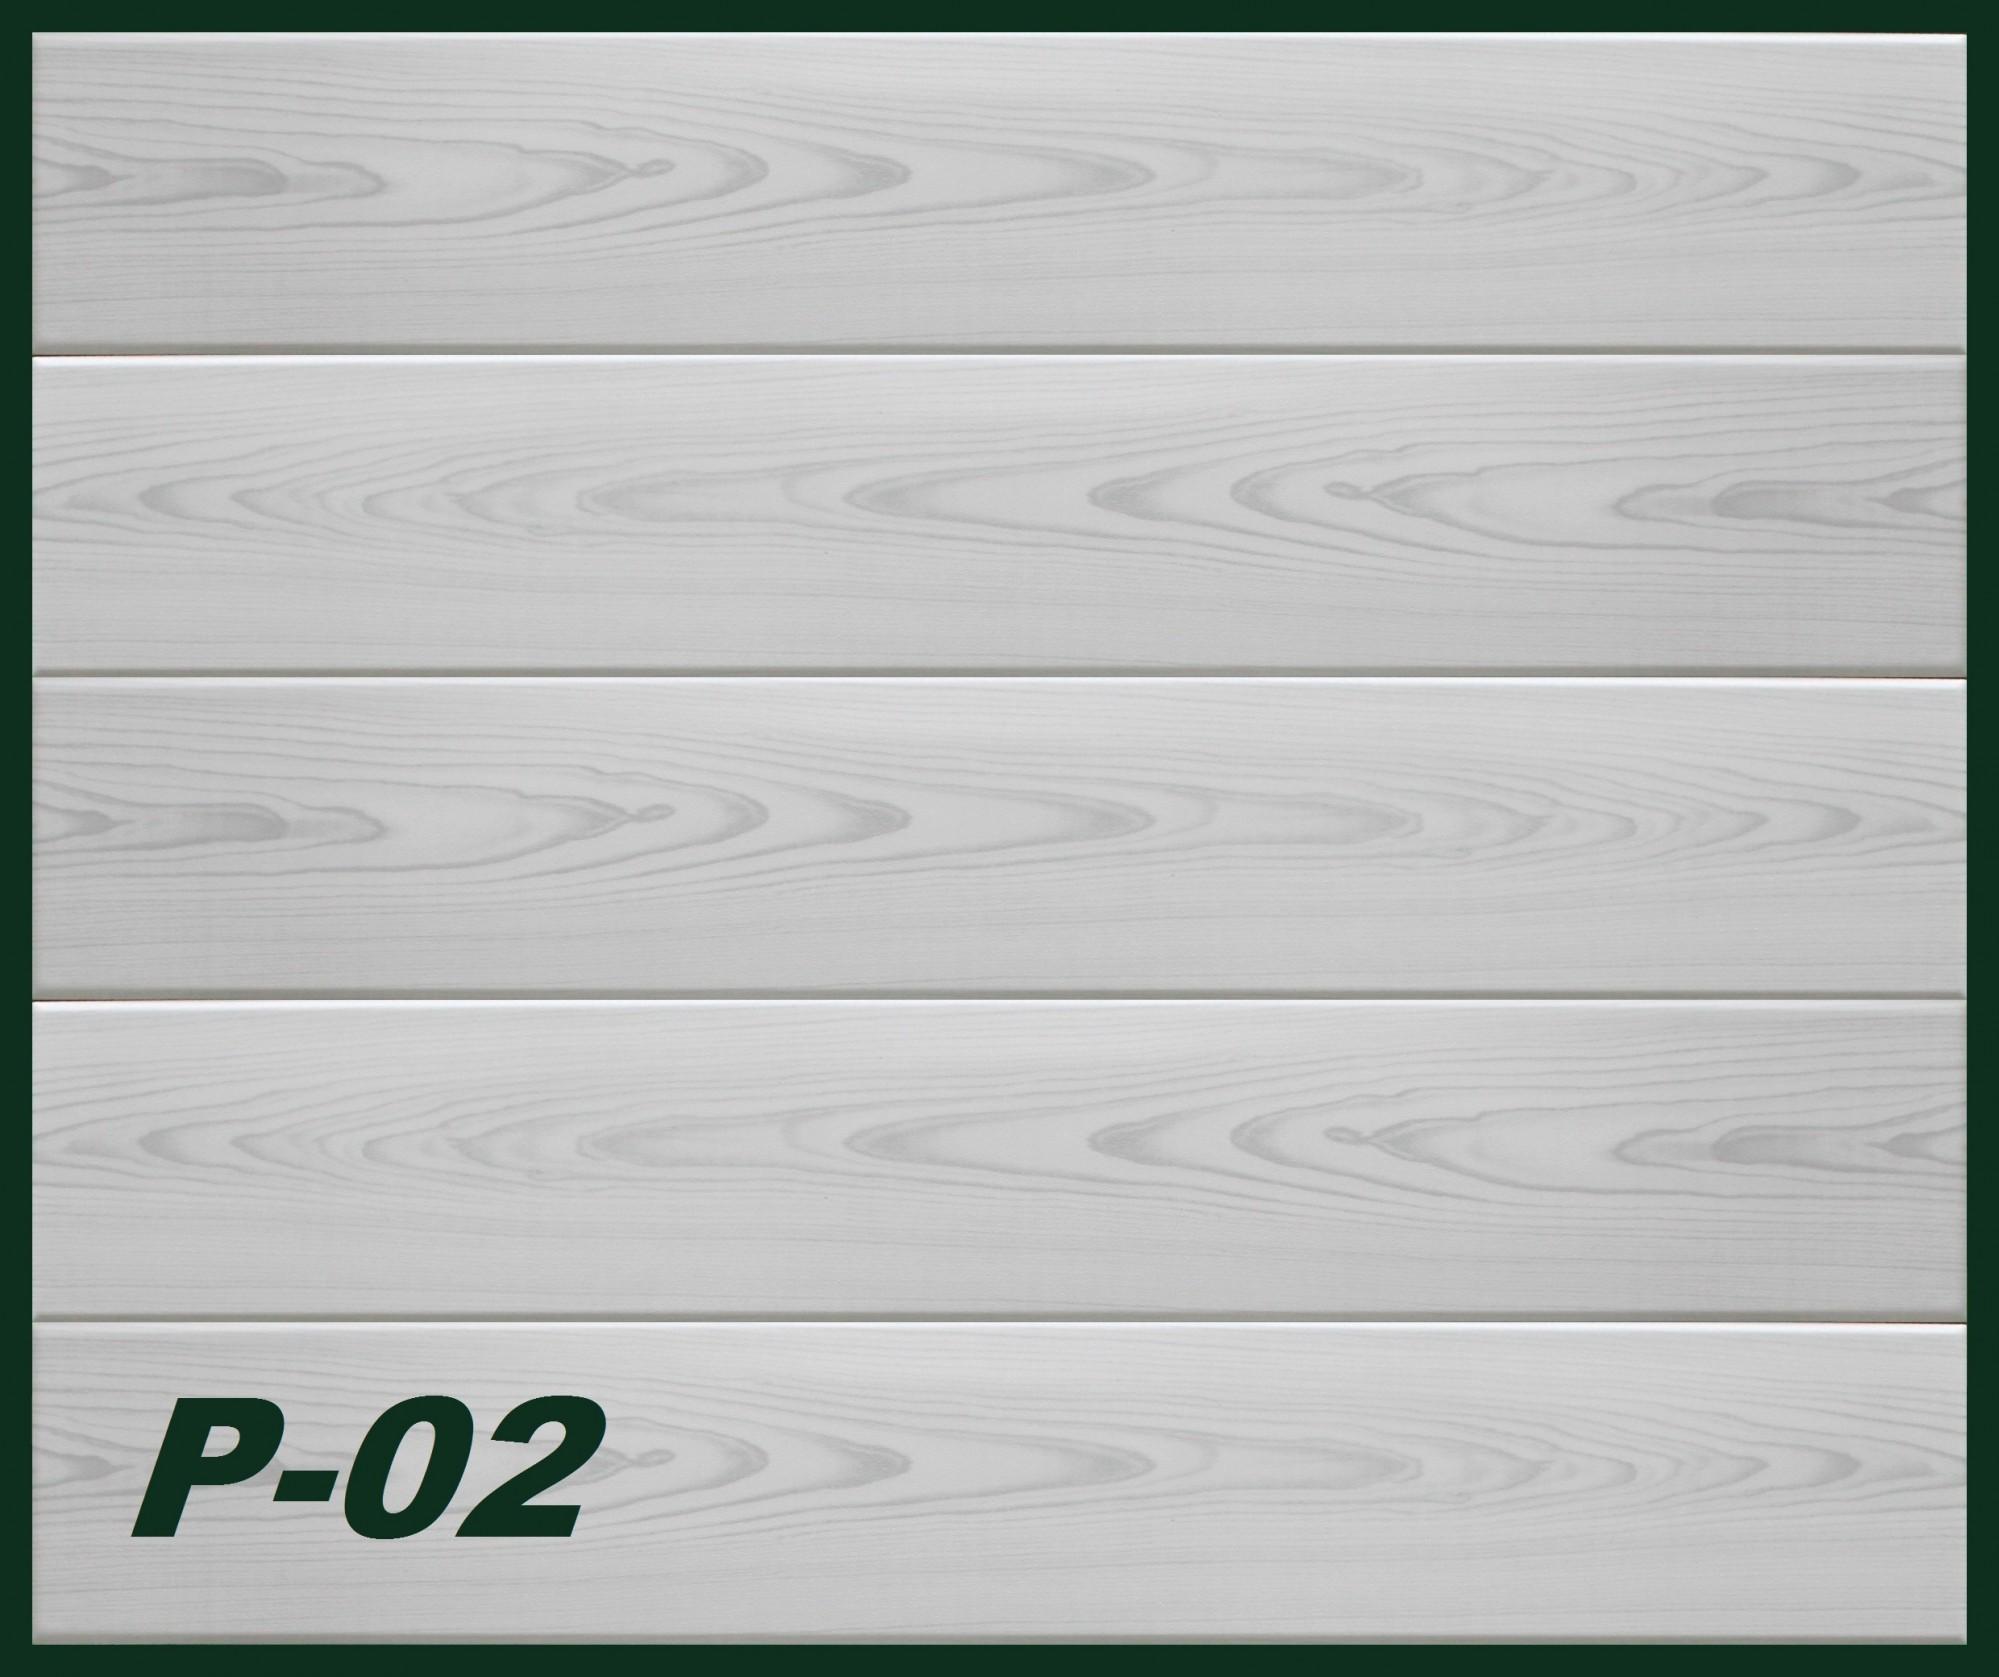 10 m2 xps deckenpaneele wandpaneele paneele dekor wand innen 100x16 7cm p 02 sparpakete decken. Black Bedroom Furniture Sets. Home Design Ideas